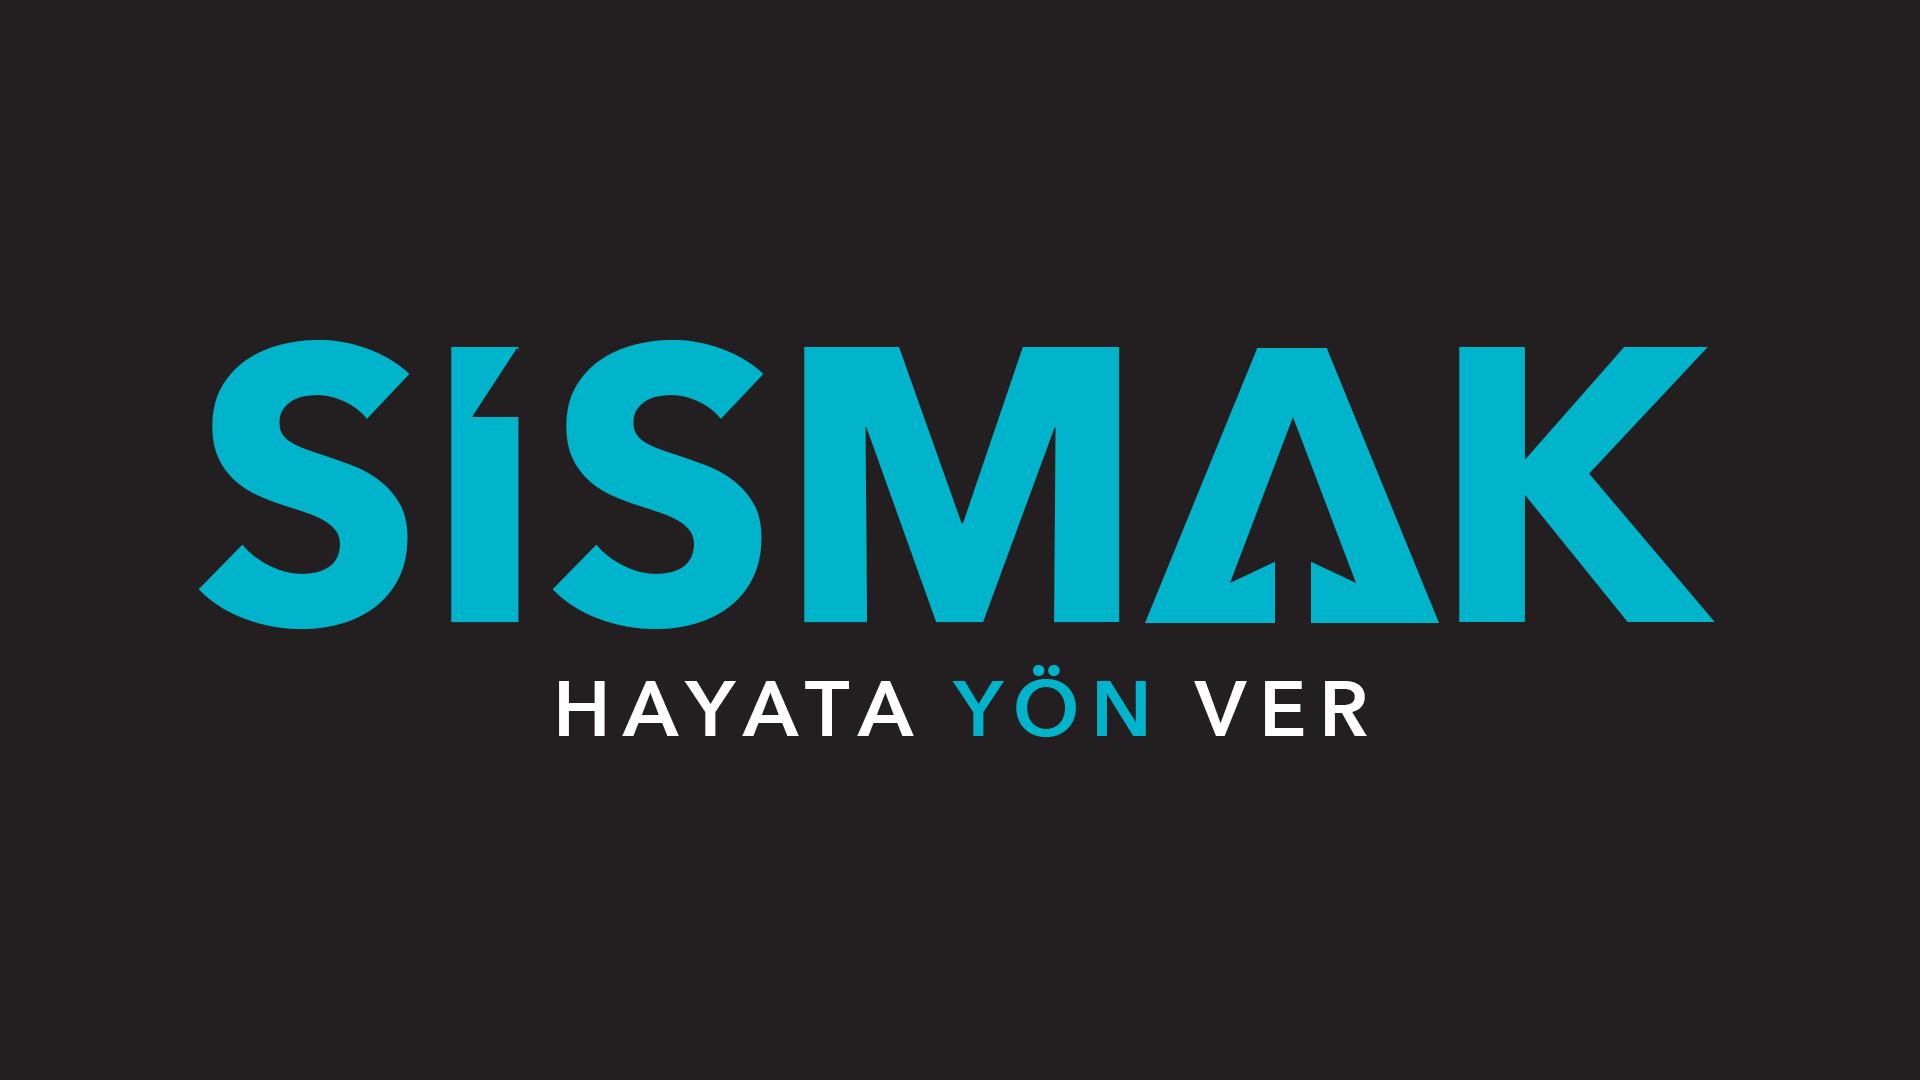 sismak-logo-hayata-yon-ver